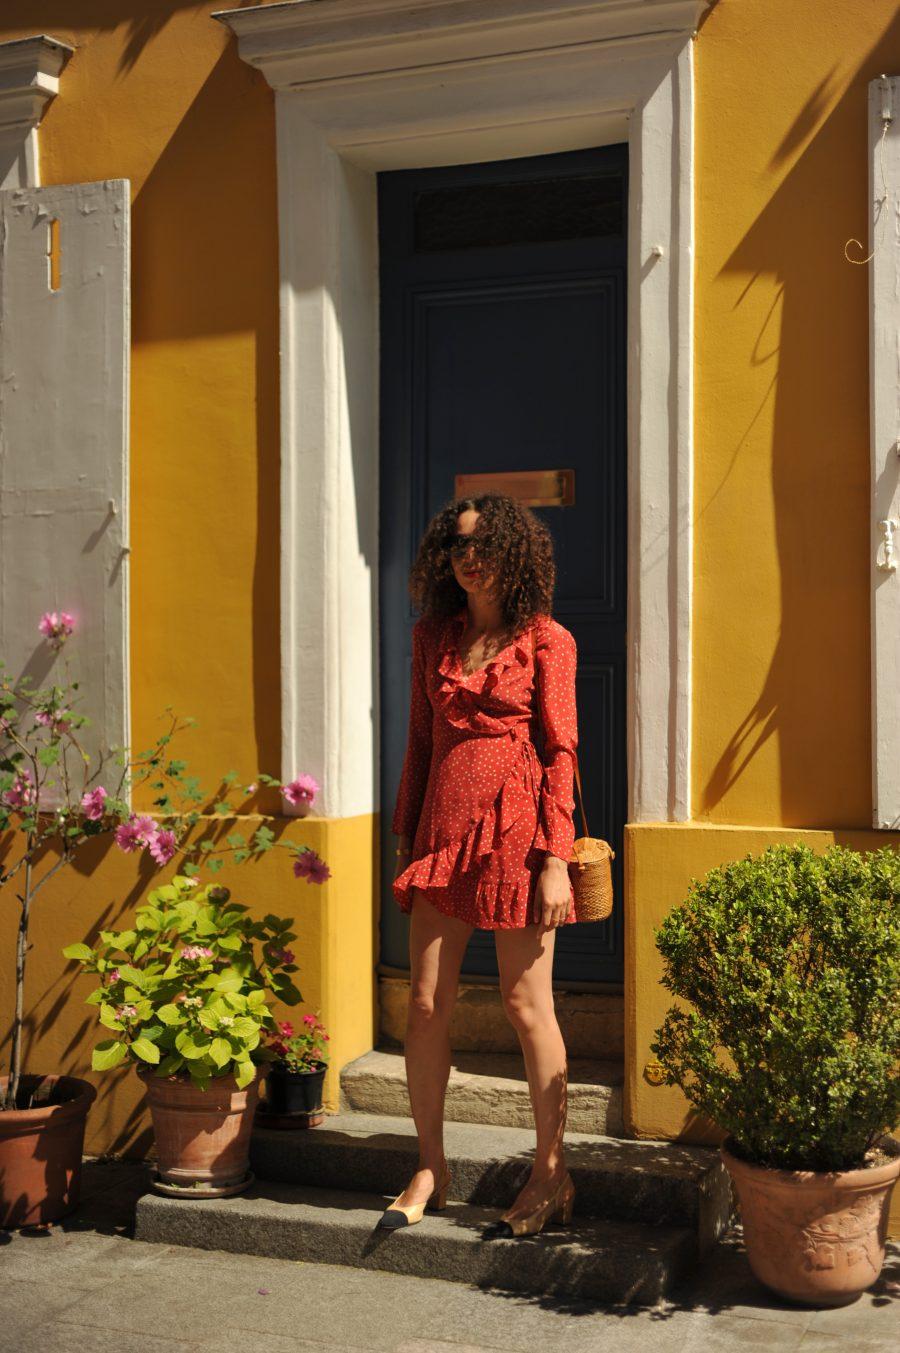 la-petite-robe-rouge-paris-7